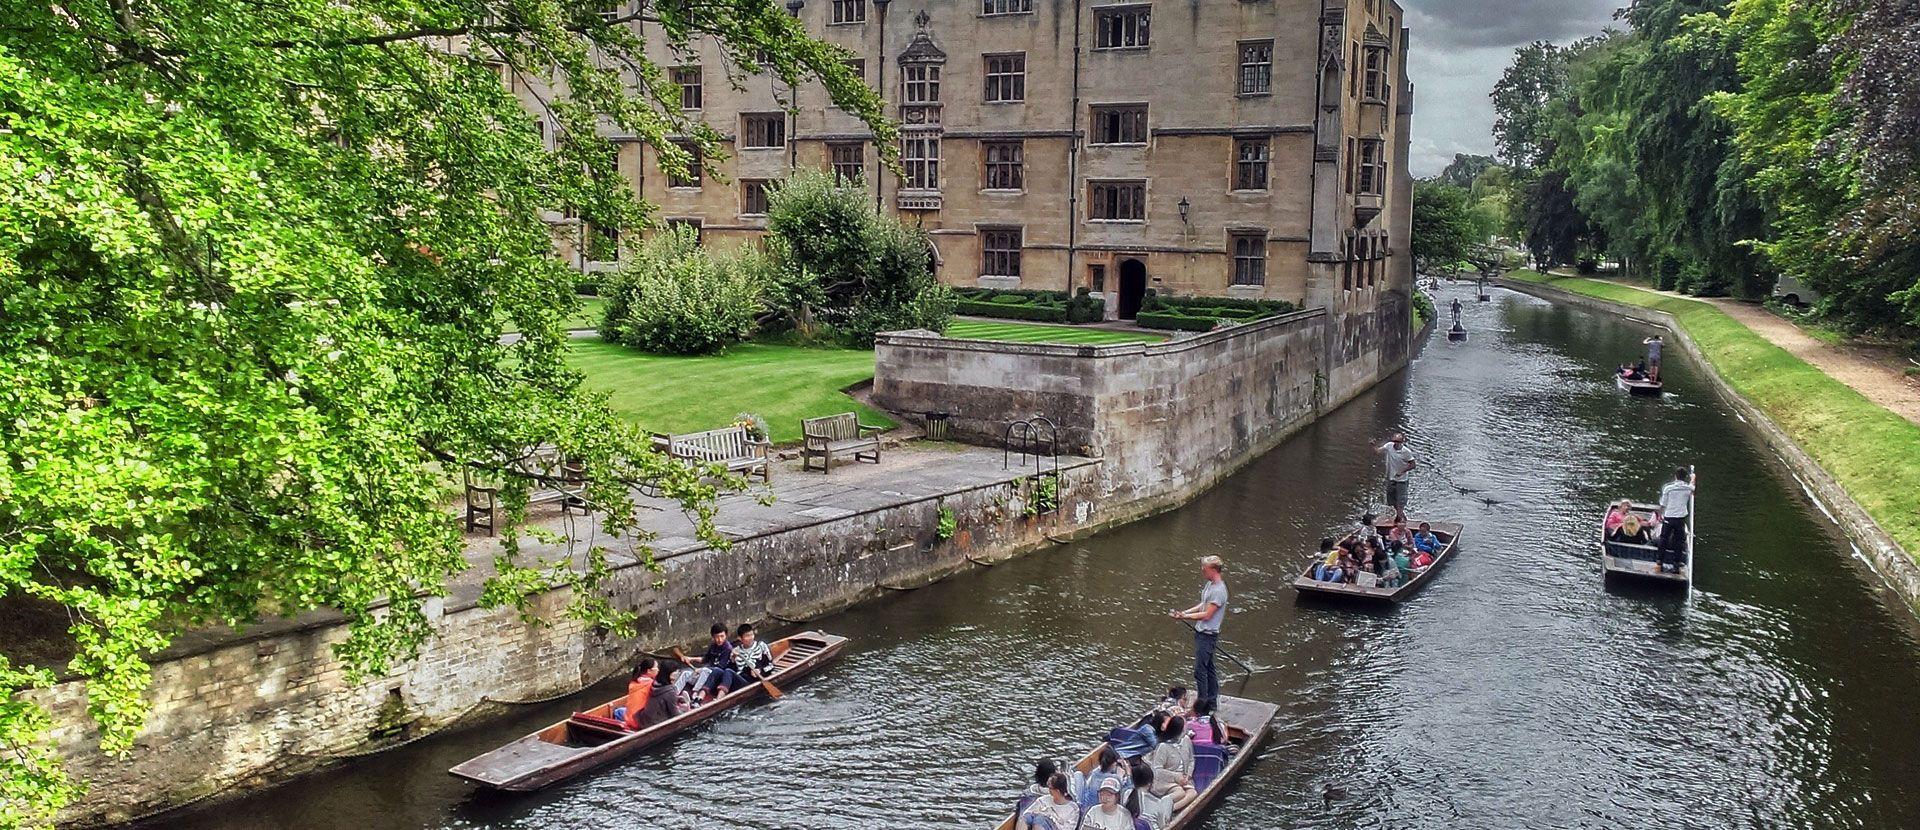 Cambridge Arts Cambridge Reino Unido curso de ingles ASTEX